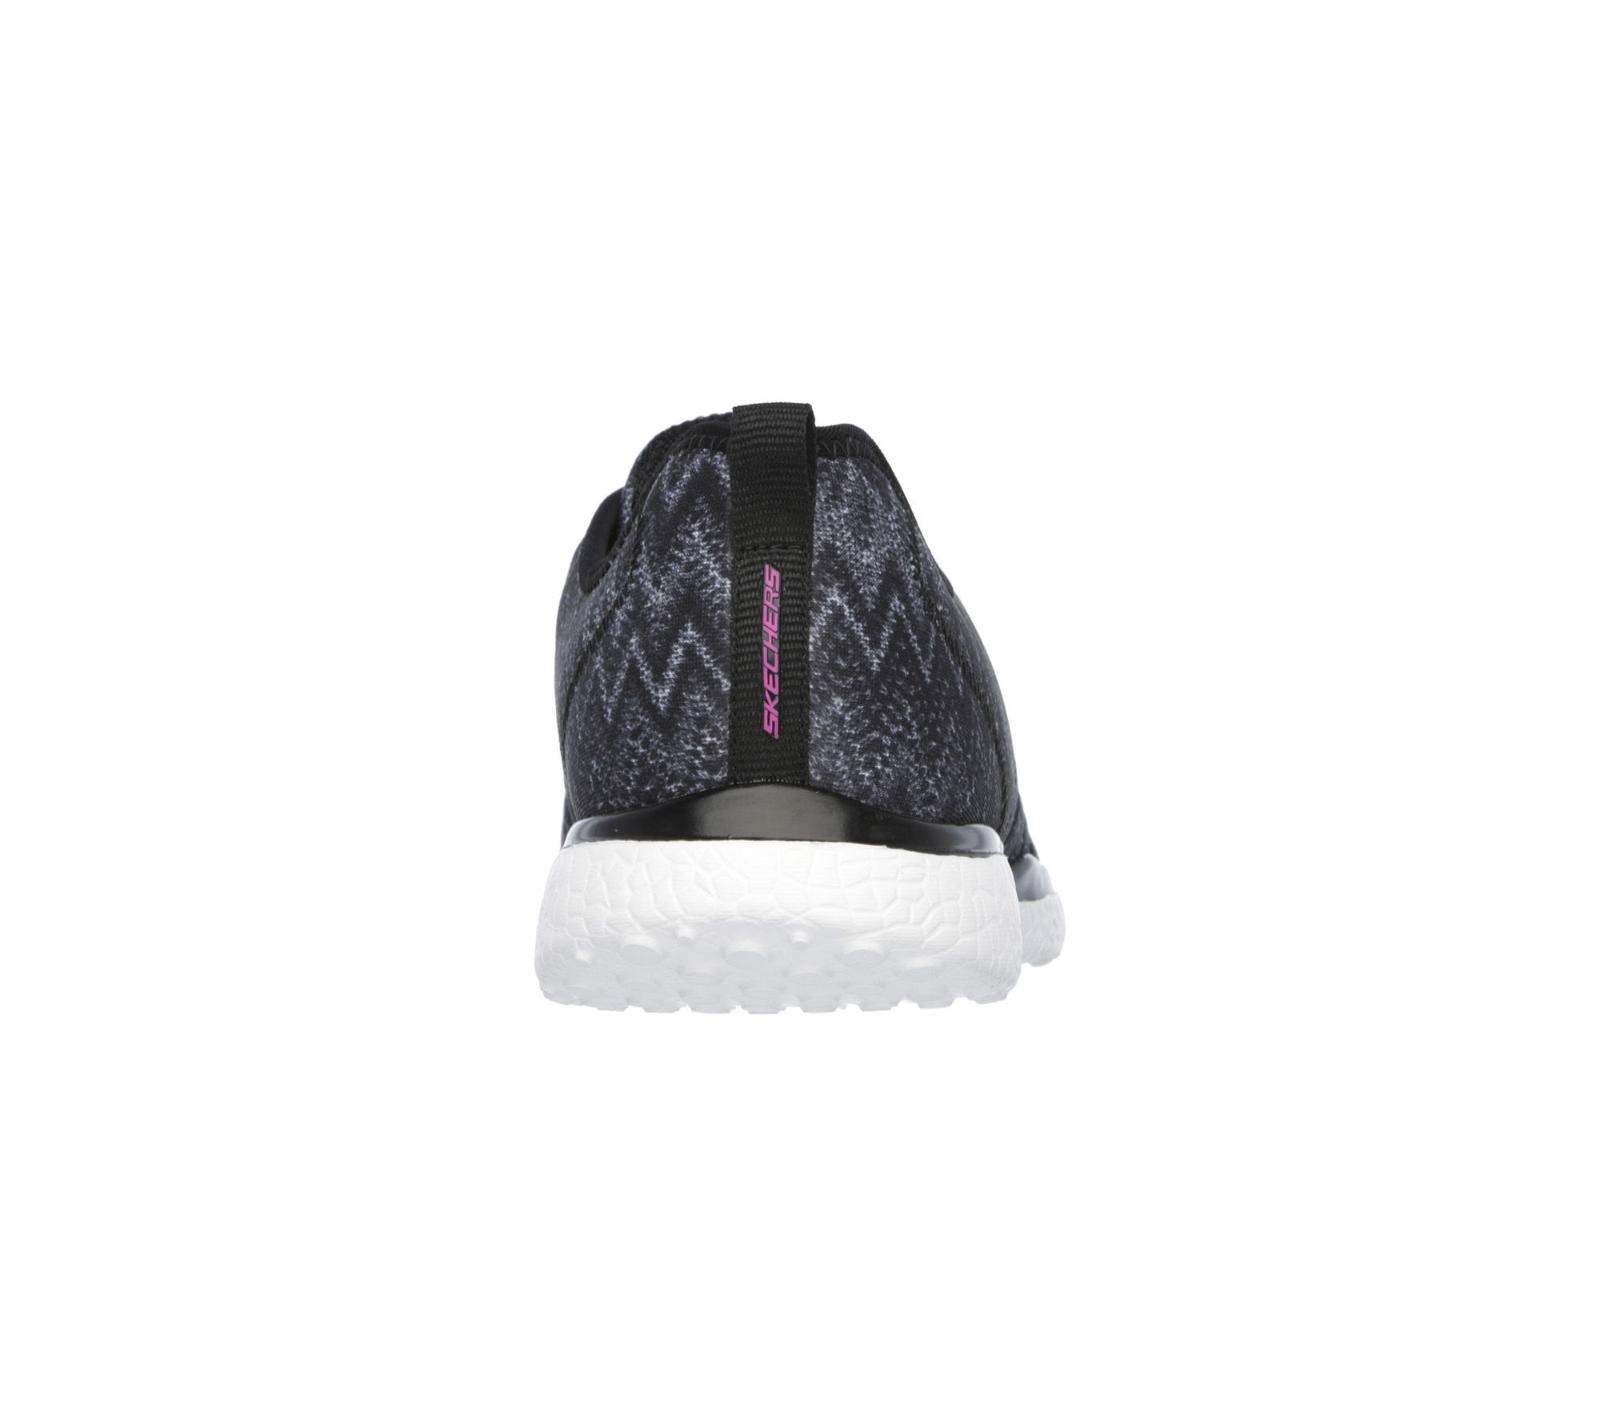 Women's Skechers Fluctuate Walking Shoe Black Size 8 #NG4EL-157